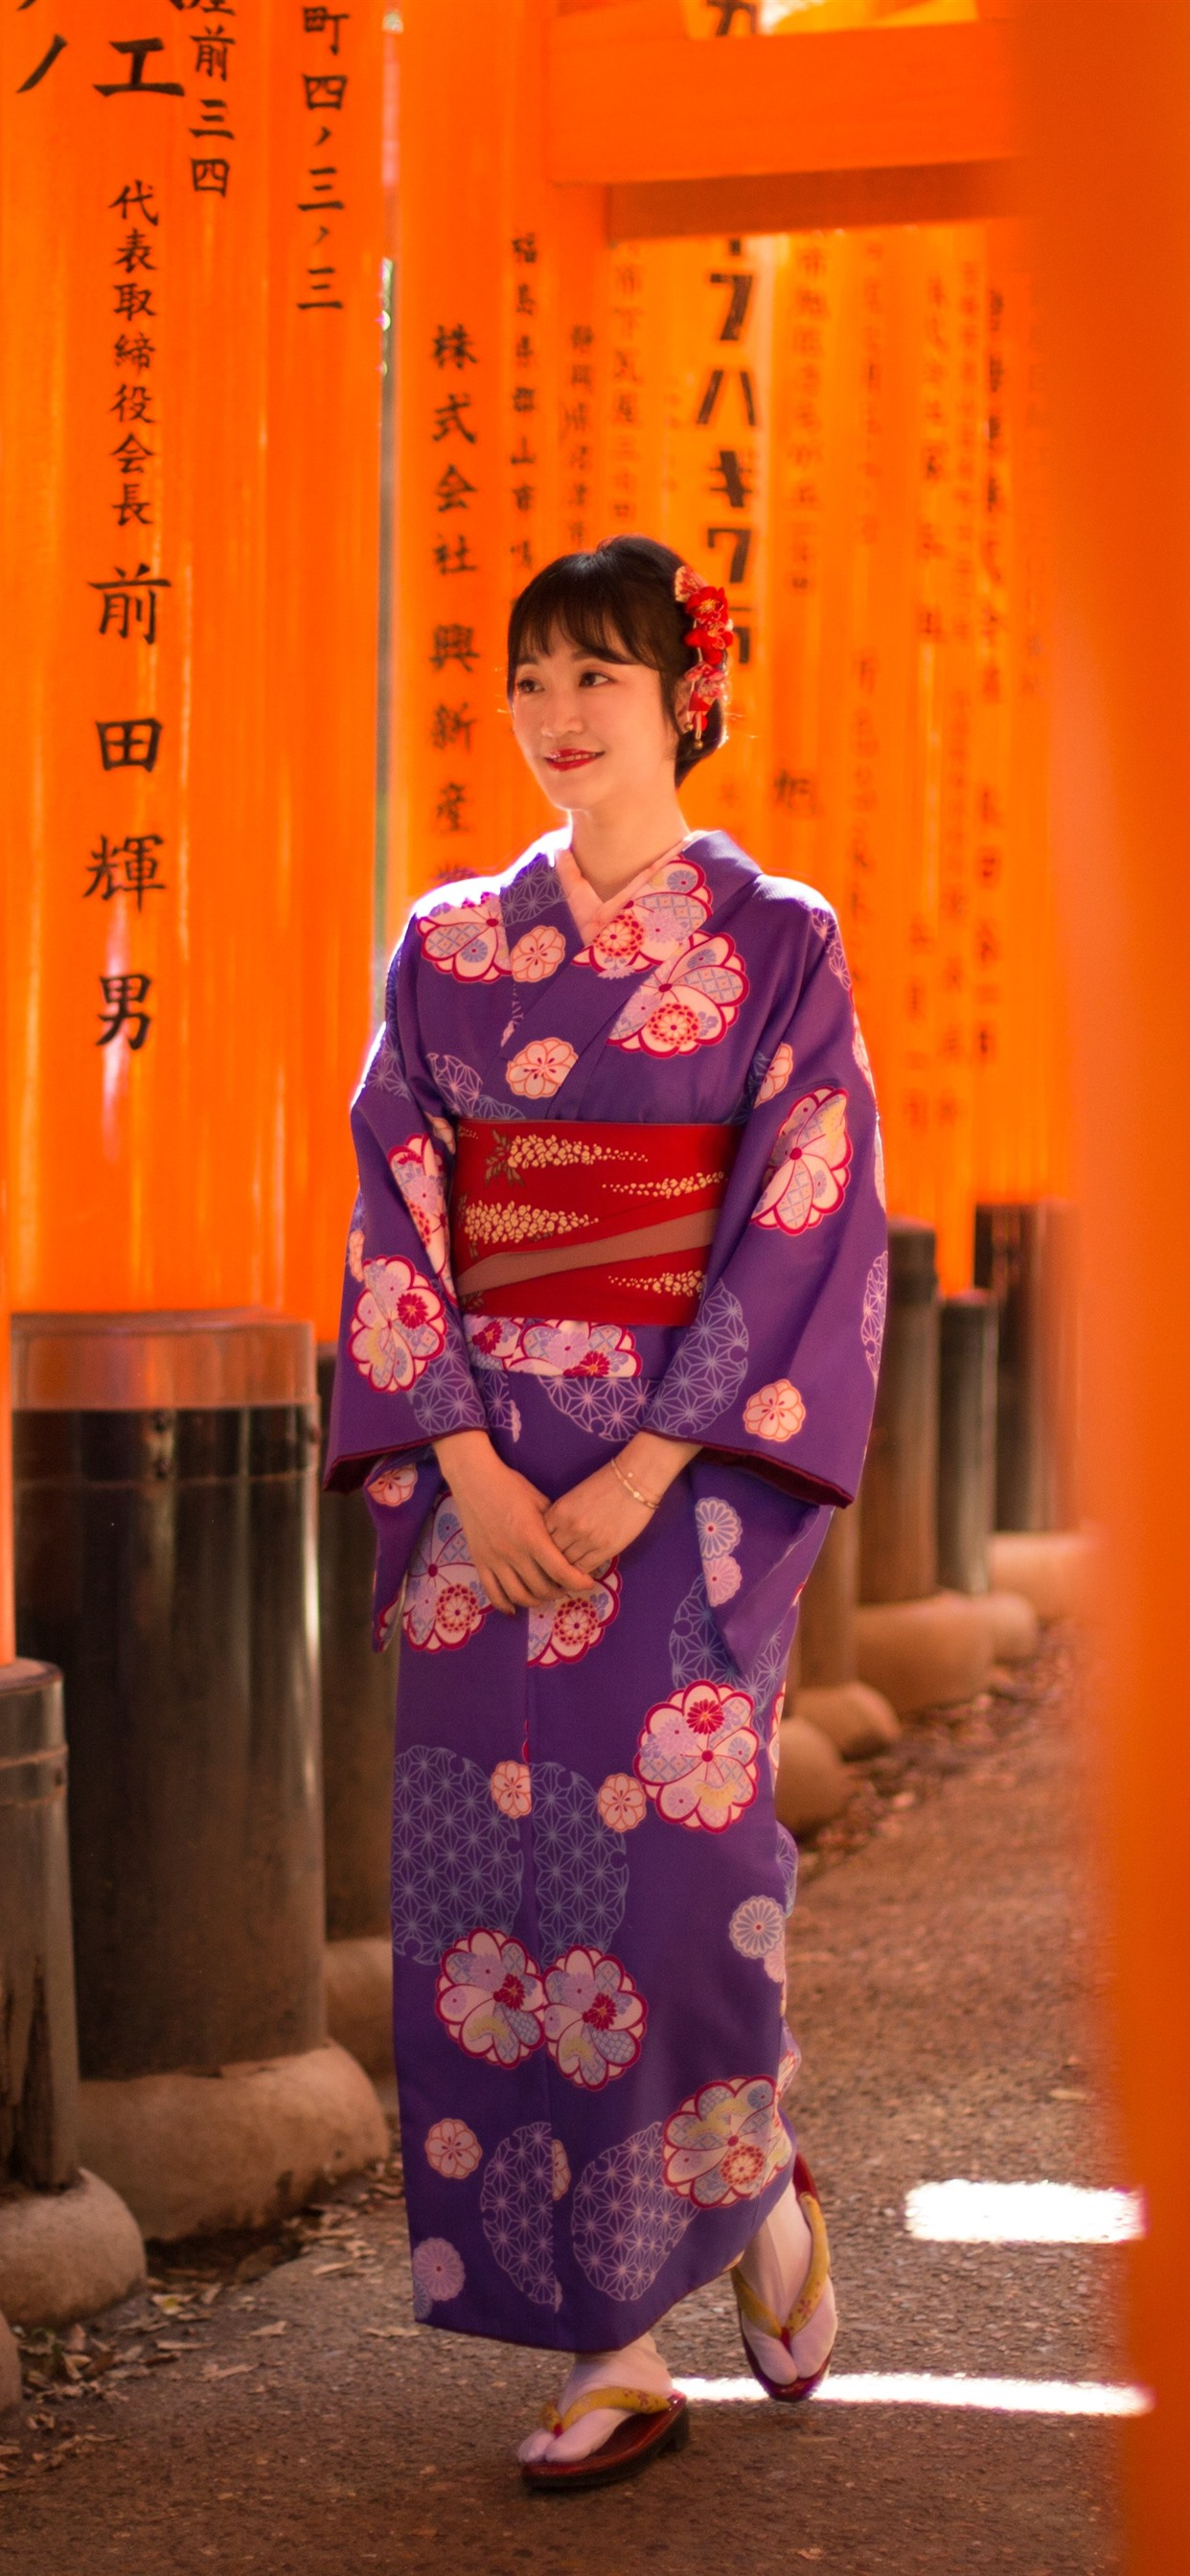 Wallpaper Smile Japanese Girl Kimono Walk 5120x2880 Uhd 5k